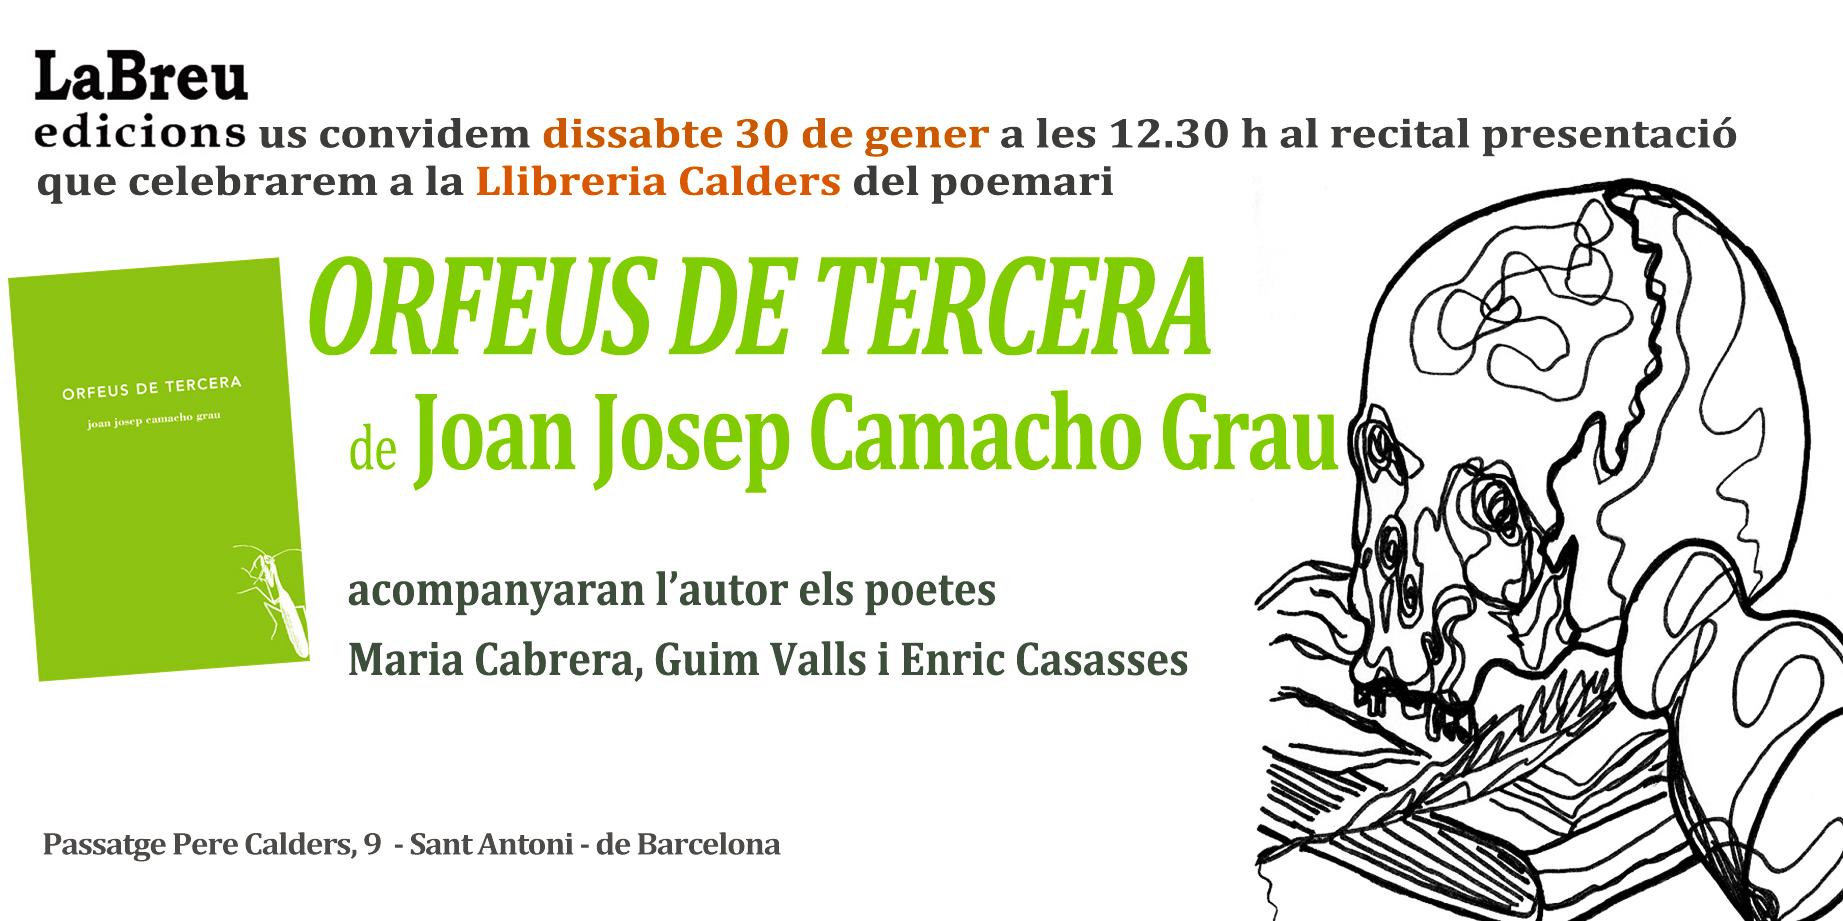 CaldersCamachoGrau